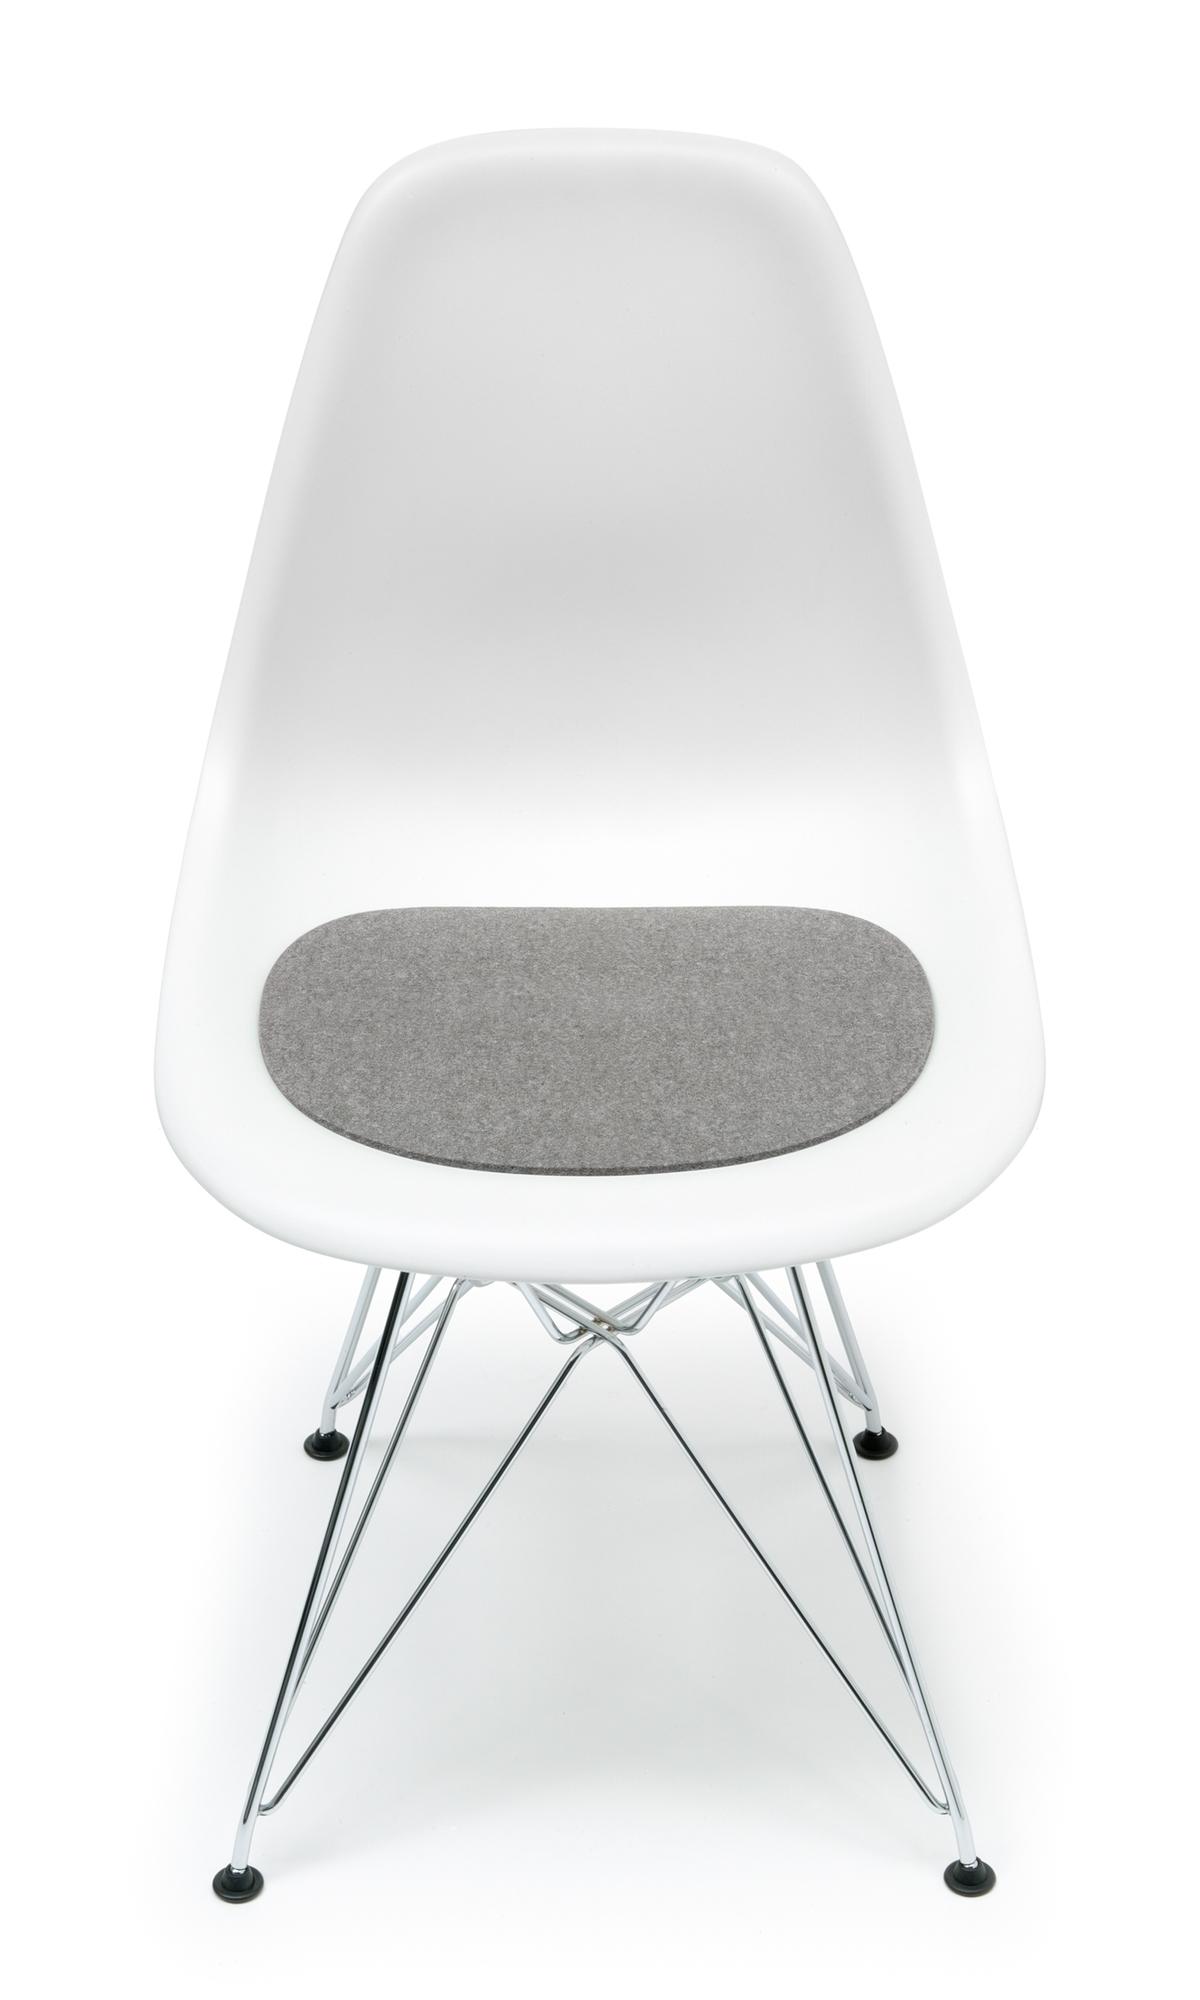 Sitzauflage-Filzauflage Eames Plastic Side Chairs DSR / DSW Hell meliert Hey Sign